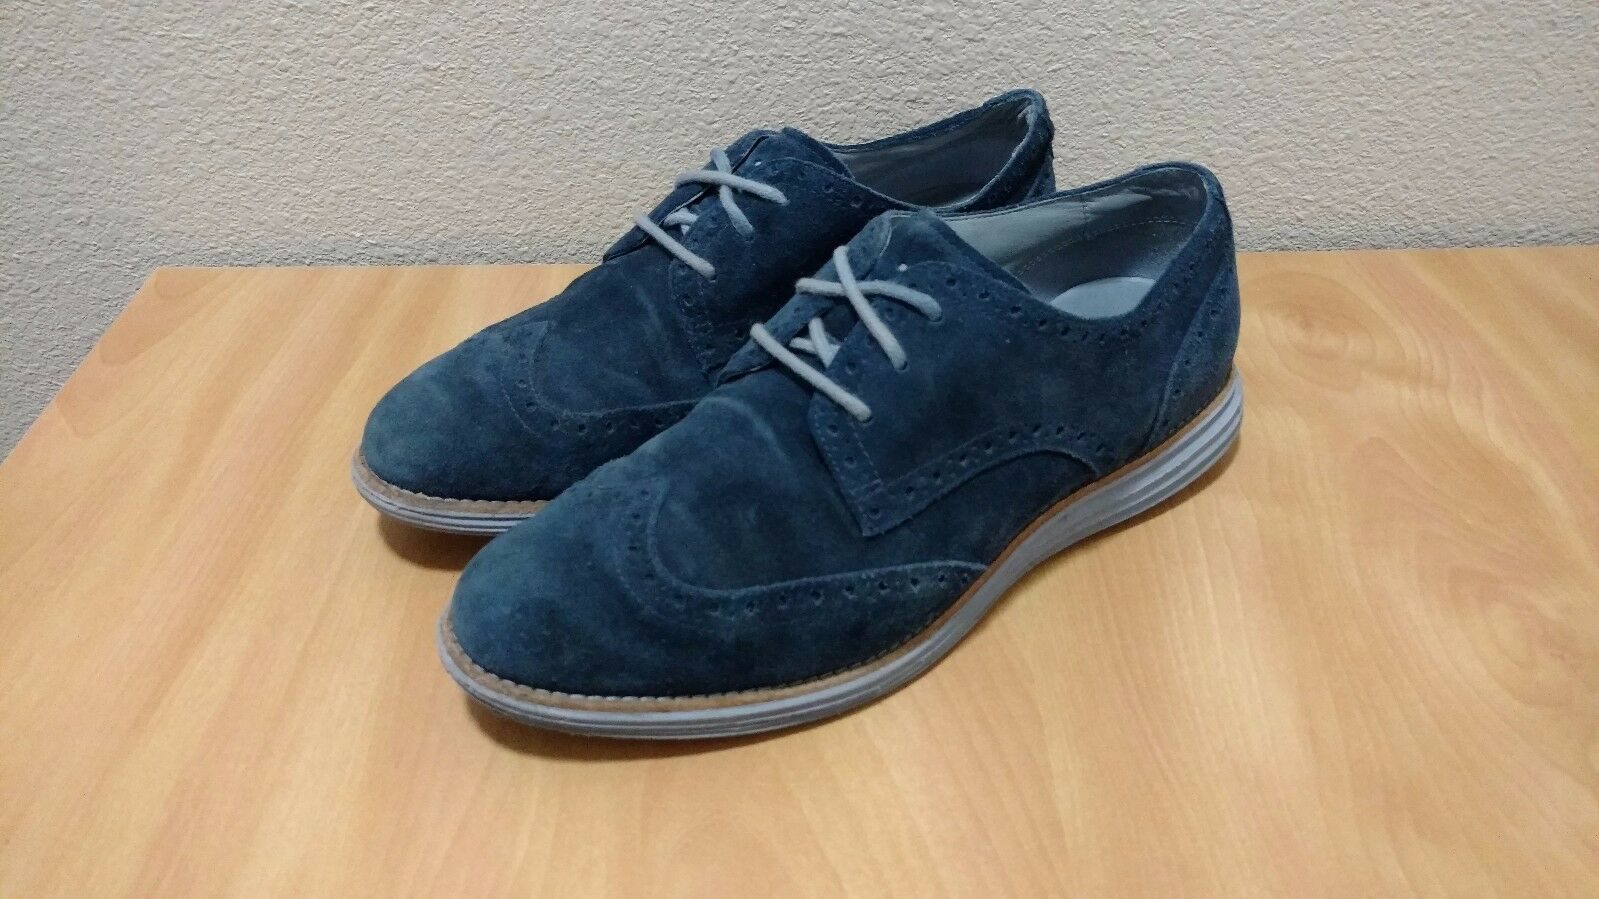 NicE Blazer COLE Haan LUNARGRAND Wingtip Blazer NicE Blau Suede Damenschuhe 8 B OXFORD Free SHIP 43b109